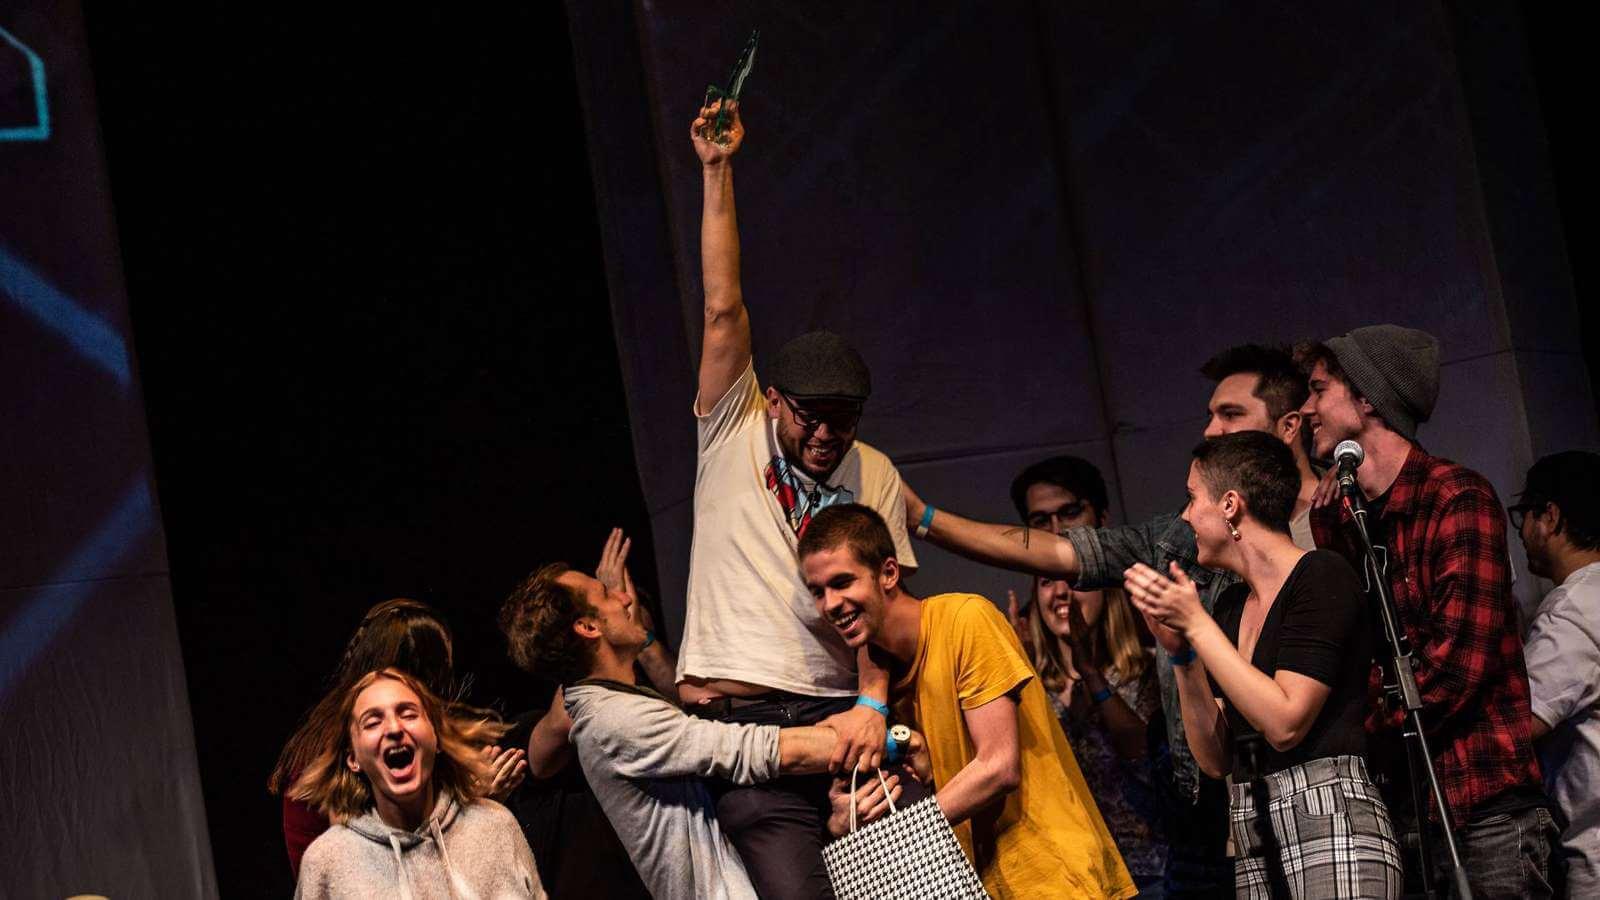 Sárközi Richárd is the new Hungarian Slam Poetry Champion